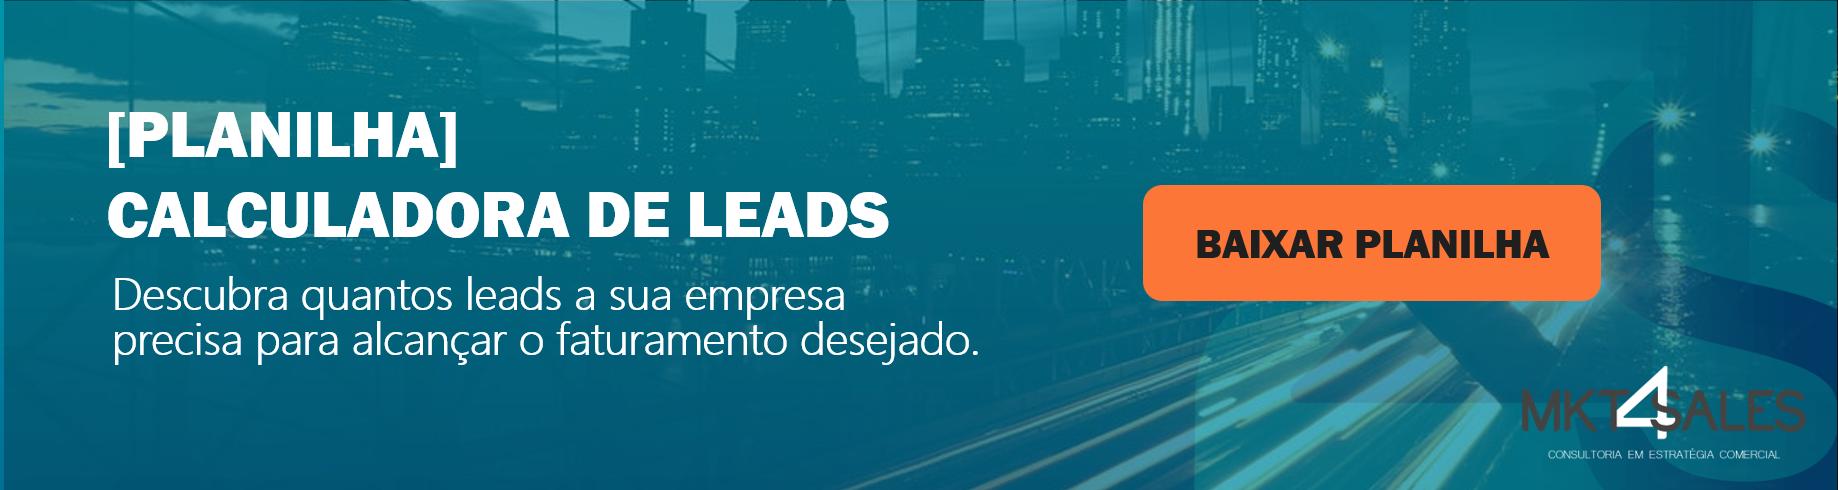 banner_calculadora-de-leads_mkt4sales-2